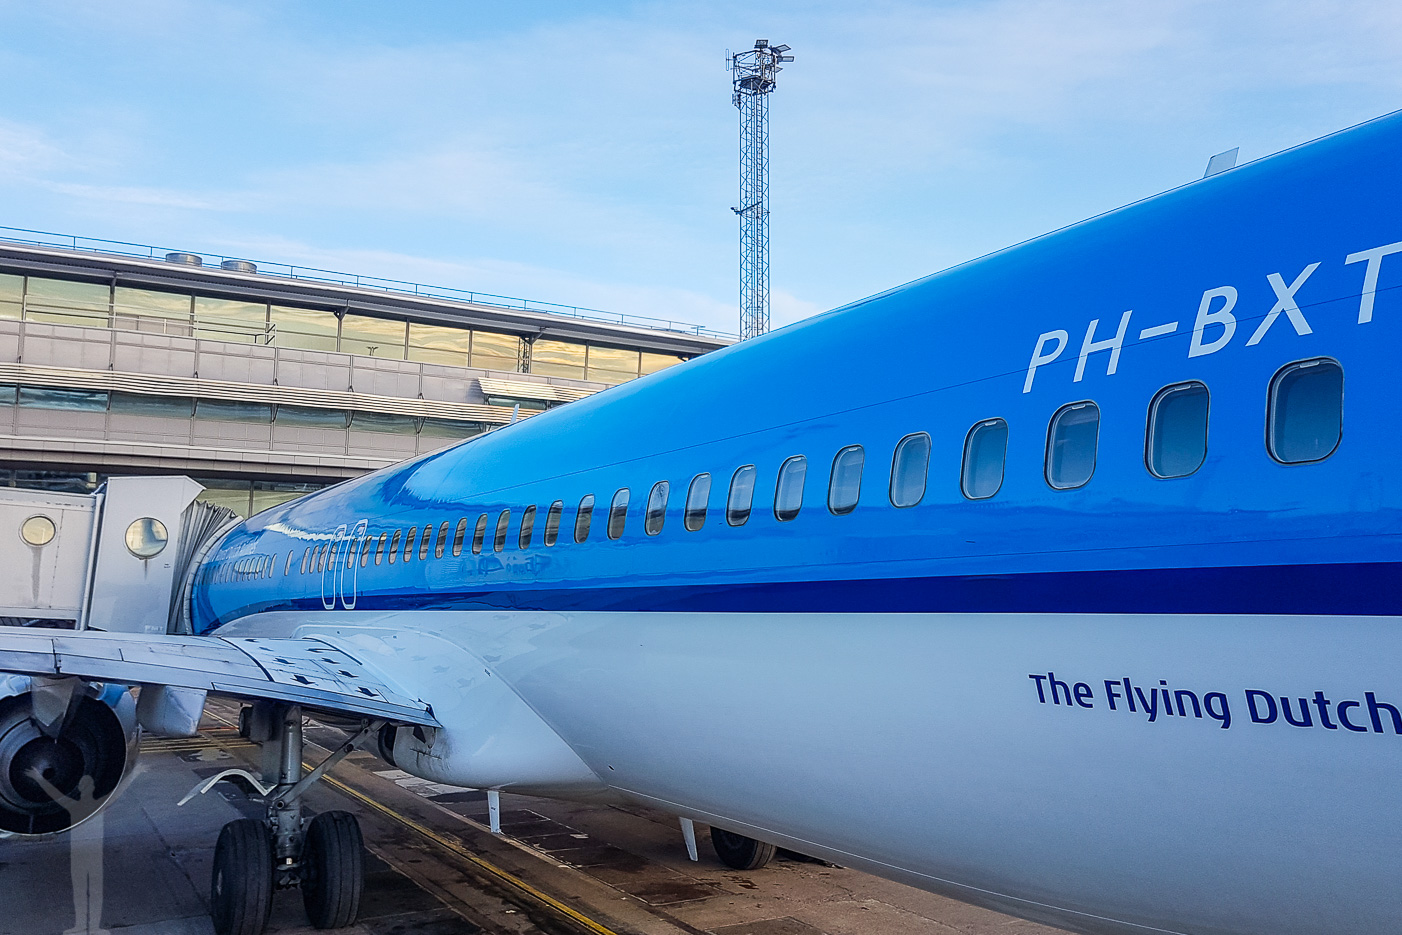 KLM PH-BXT Boeing 737-900